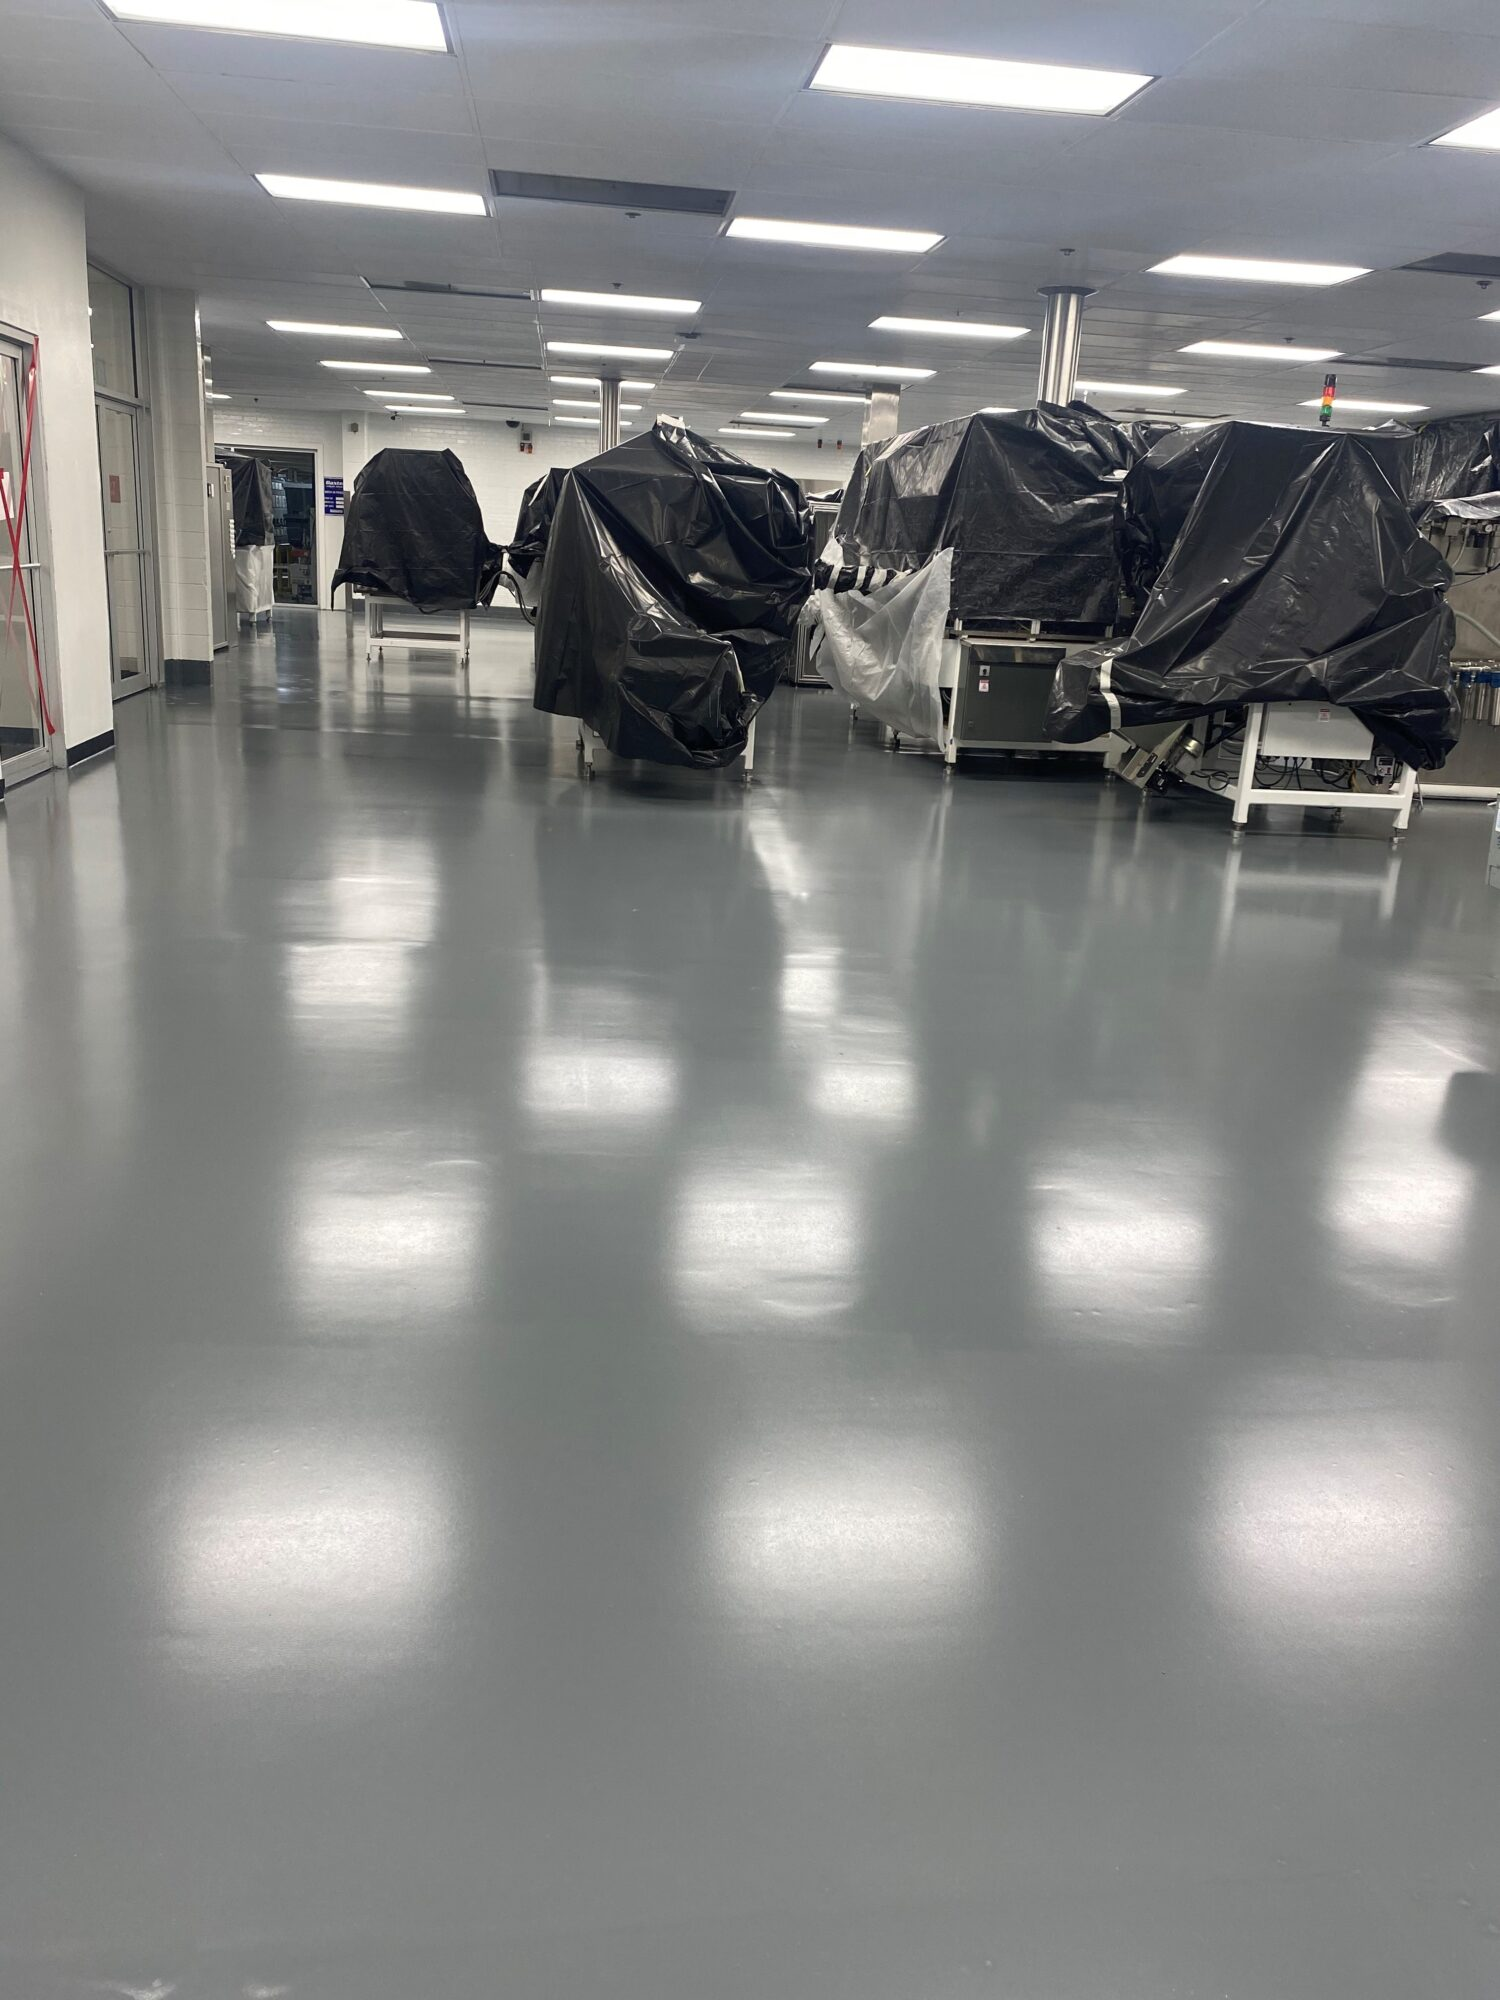 TeamIA, epoxy flooring, urethane concrete, industrial flooring, Industrial Applications Inc., concrete floor resurfacing, Cleveland MS, flooring contractor Cleveland MS